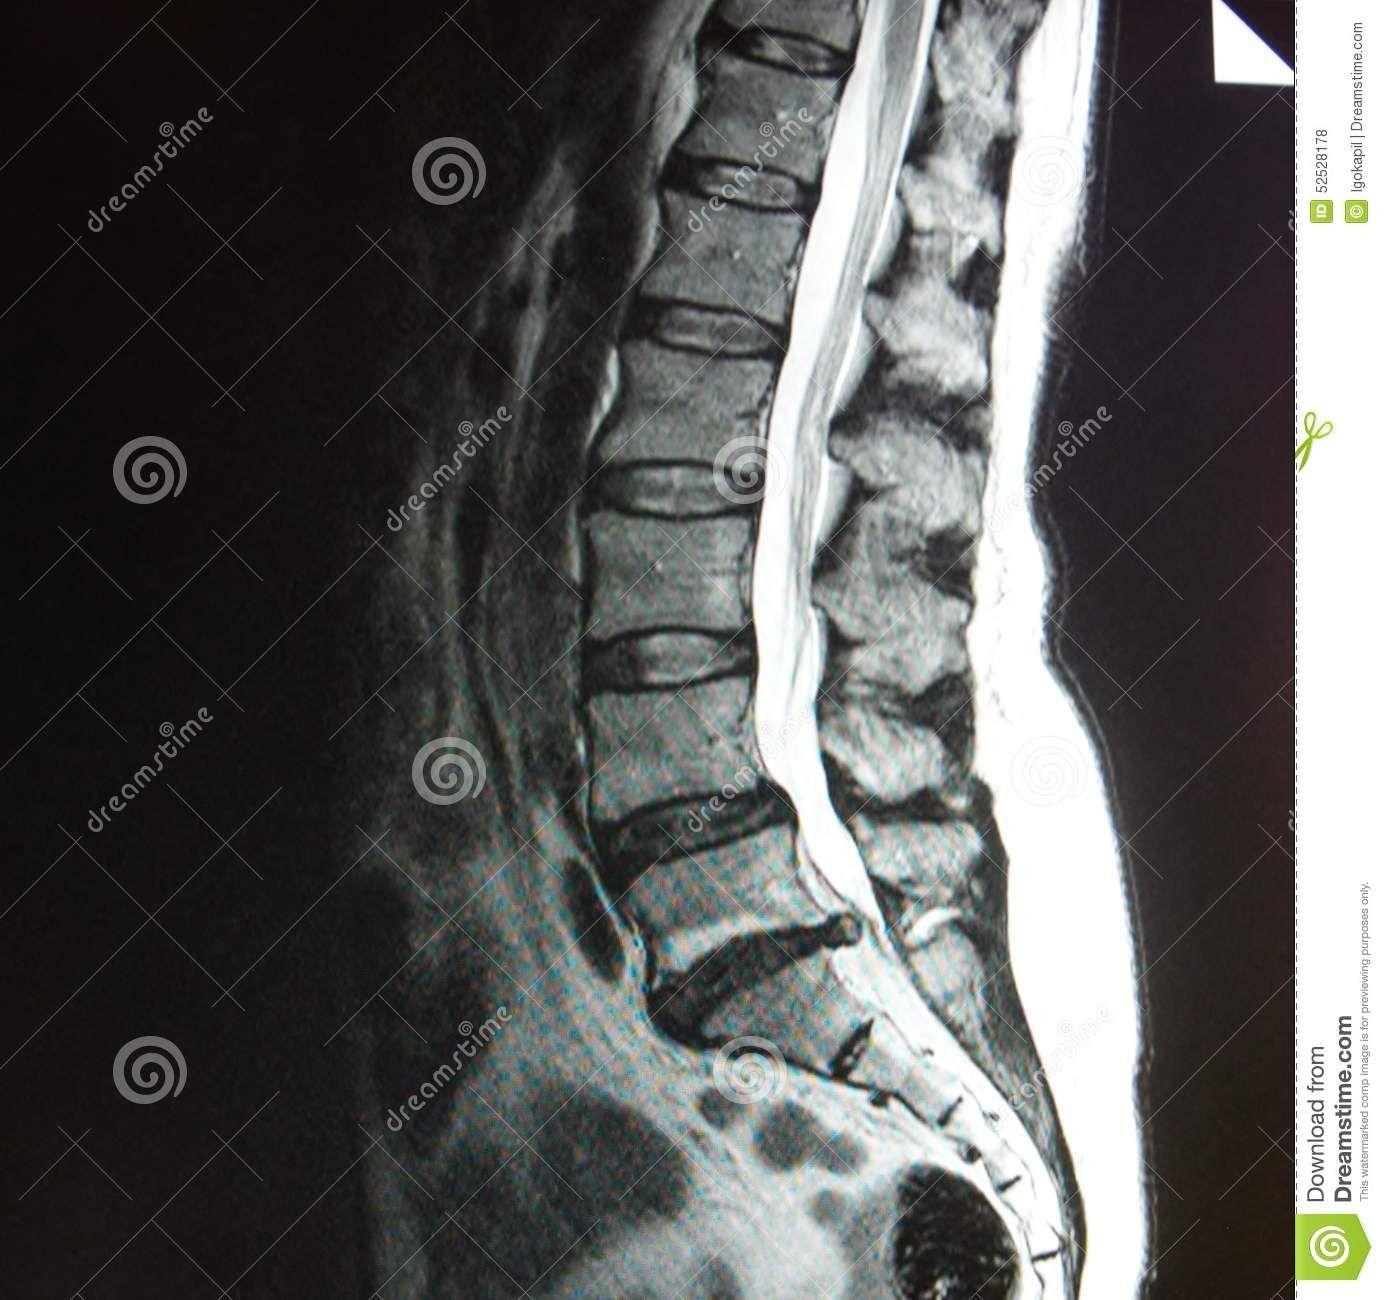 mri lumbar spine stenosis basis modern medicine modern diagnostic ...